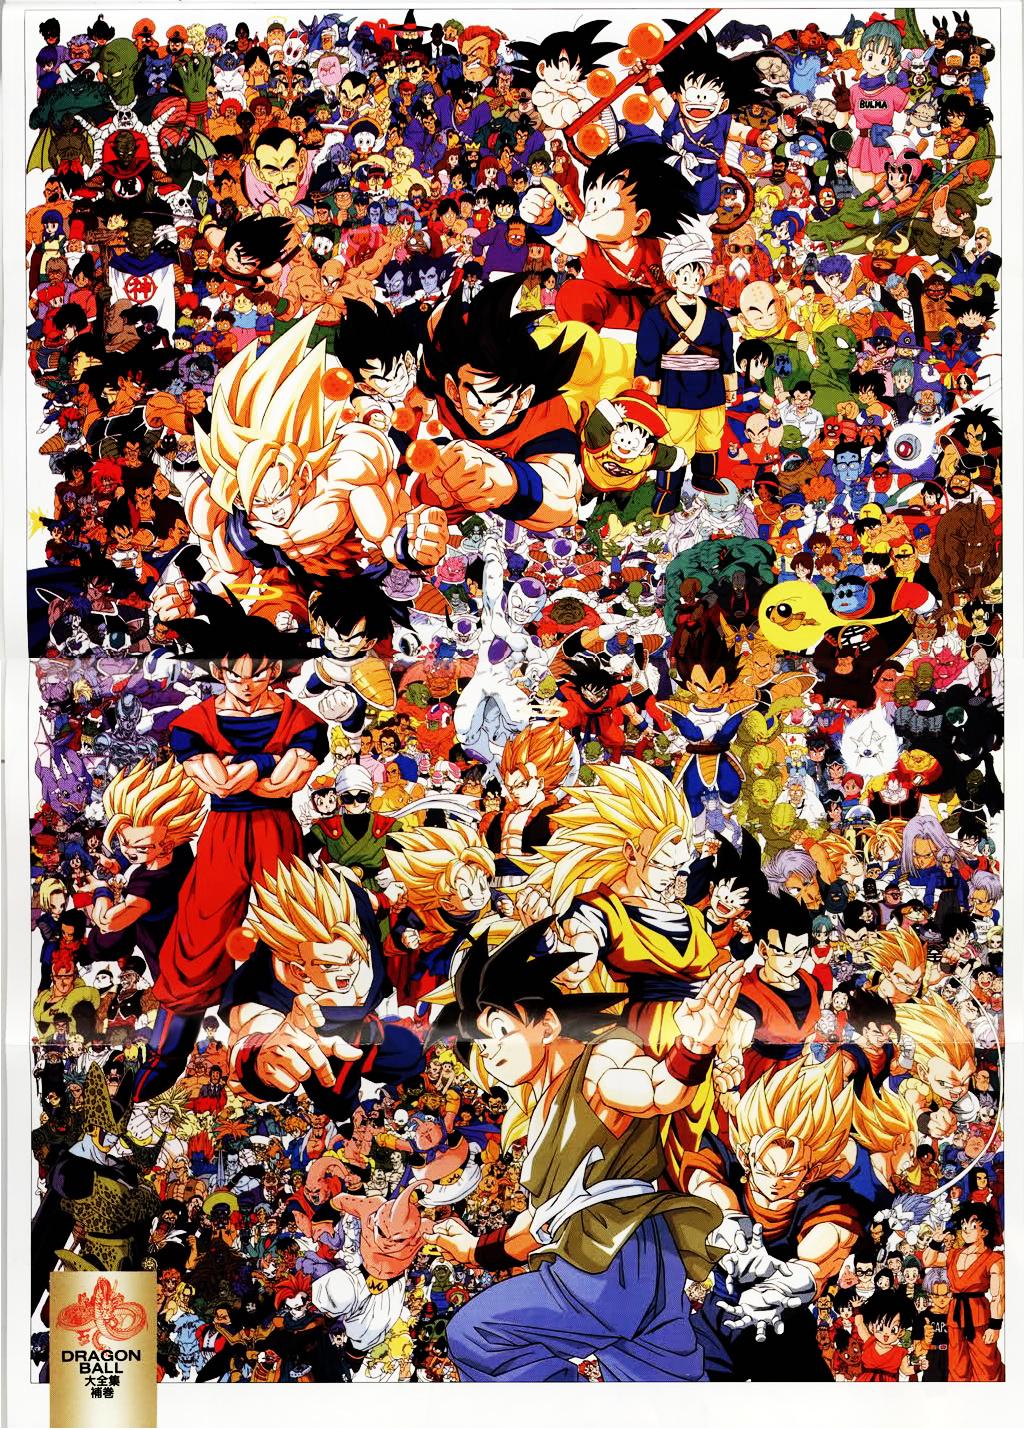 Lista de personajes - Dragon Ball Wiki - Wikia